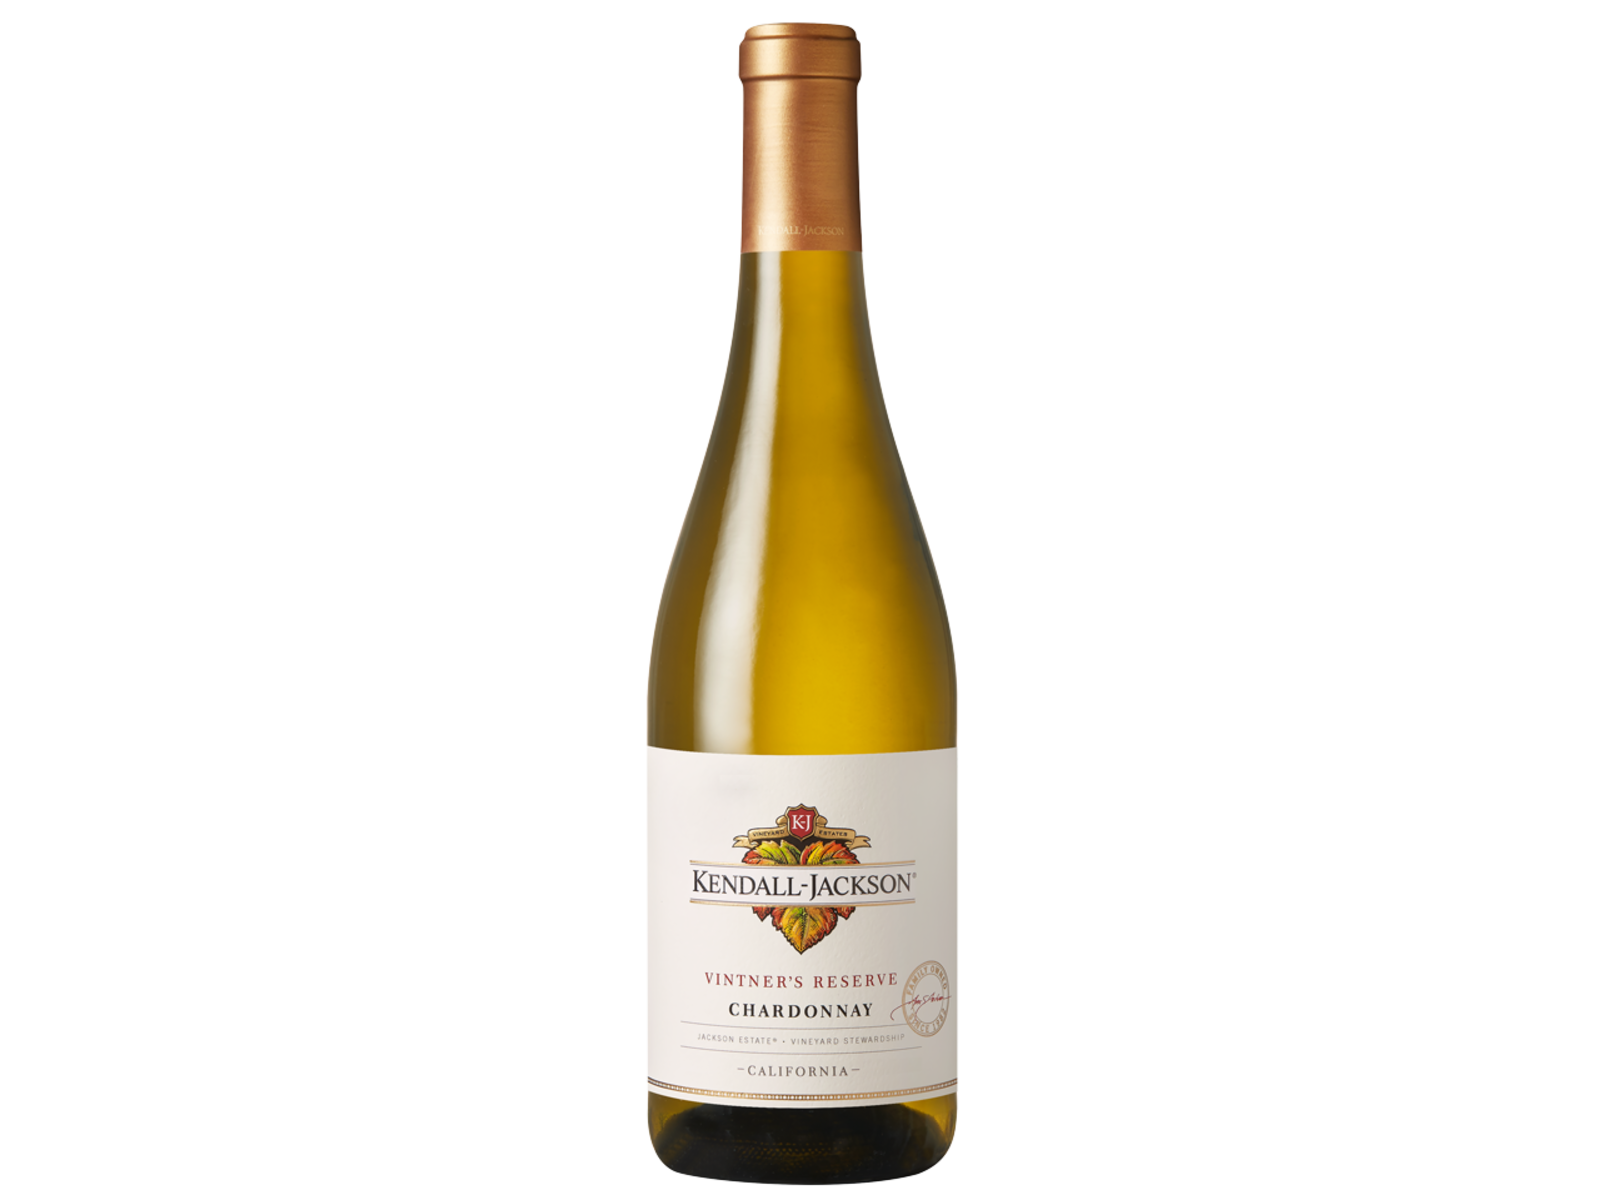 Kendall Jackson Kendall-Jackson Vintner's Reserve Chardonnay